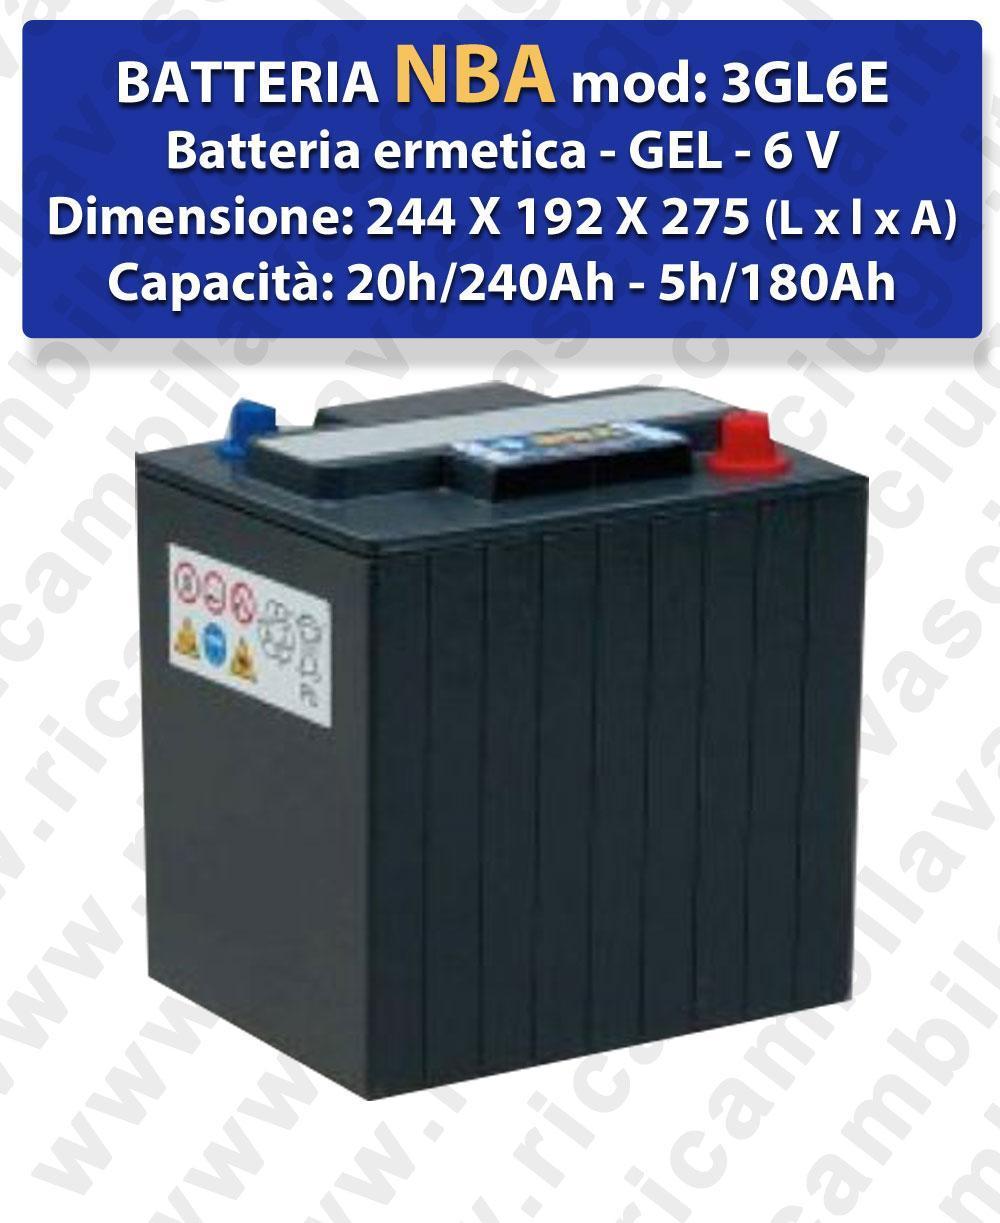 3GL6E Hermetische Batterie - Gel 6V 240Ah 20/h NBA